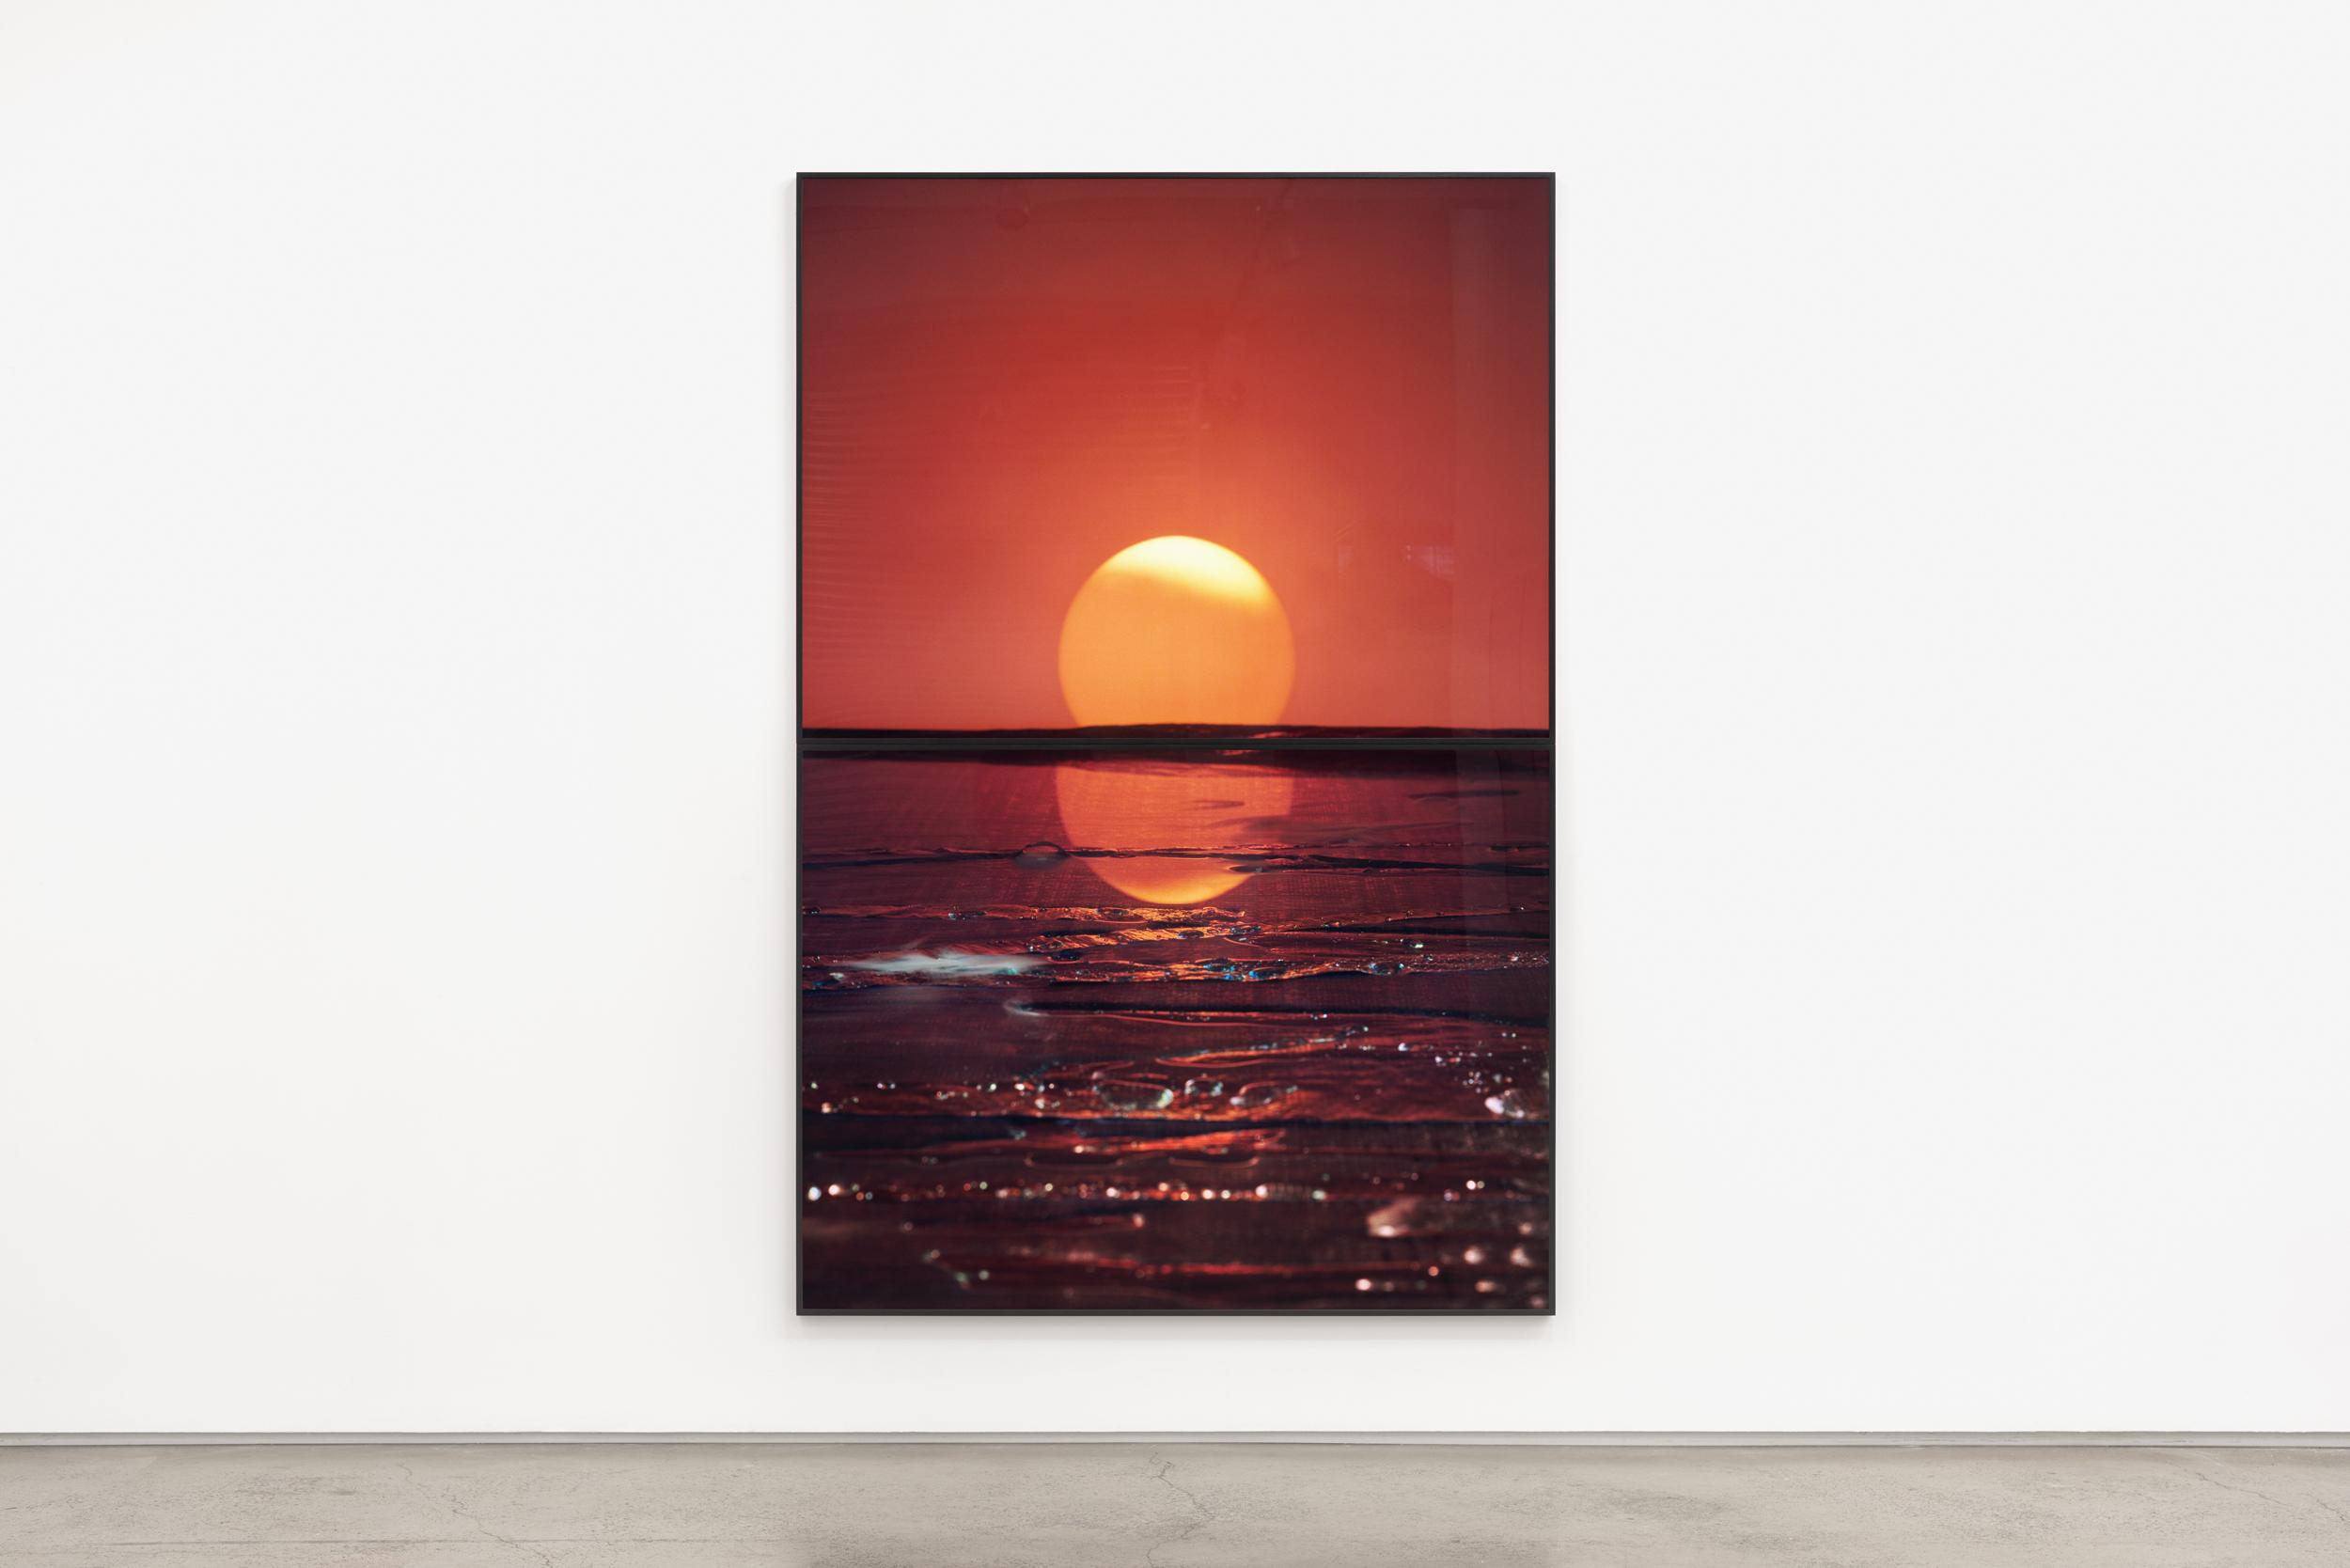 Darren Sylvester,  IKEA Sunrise , 2018, lightjet prints, 240 x 160 cm